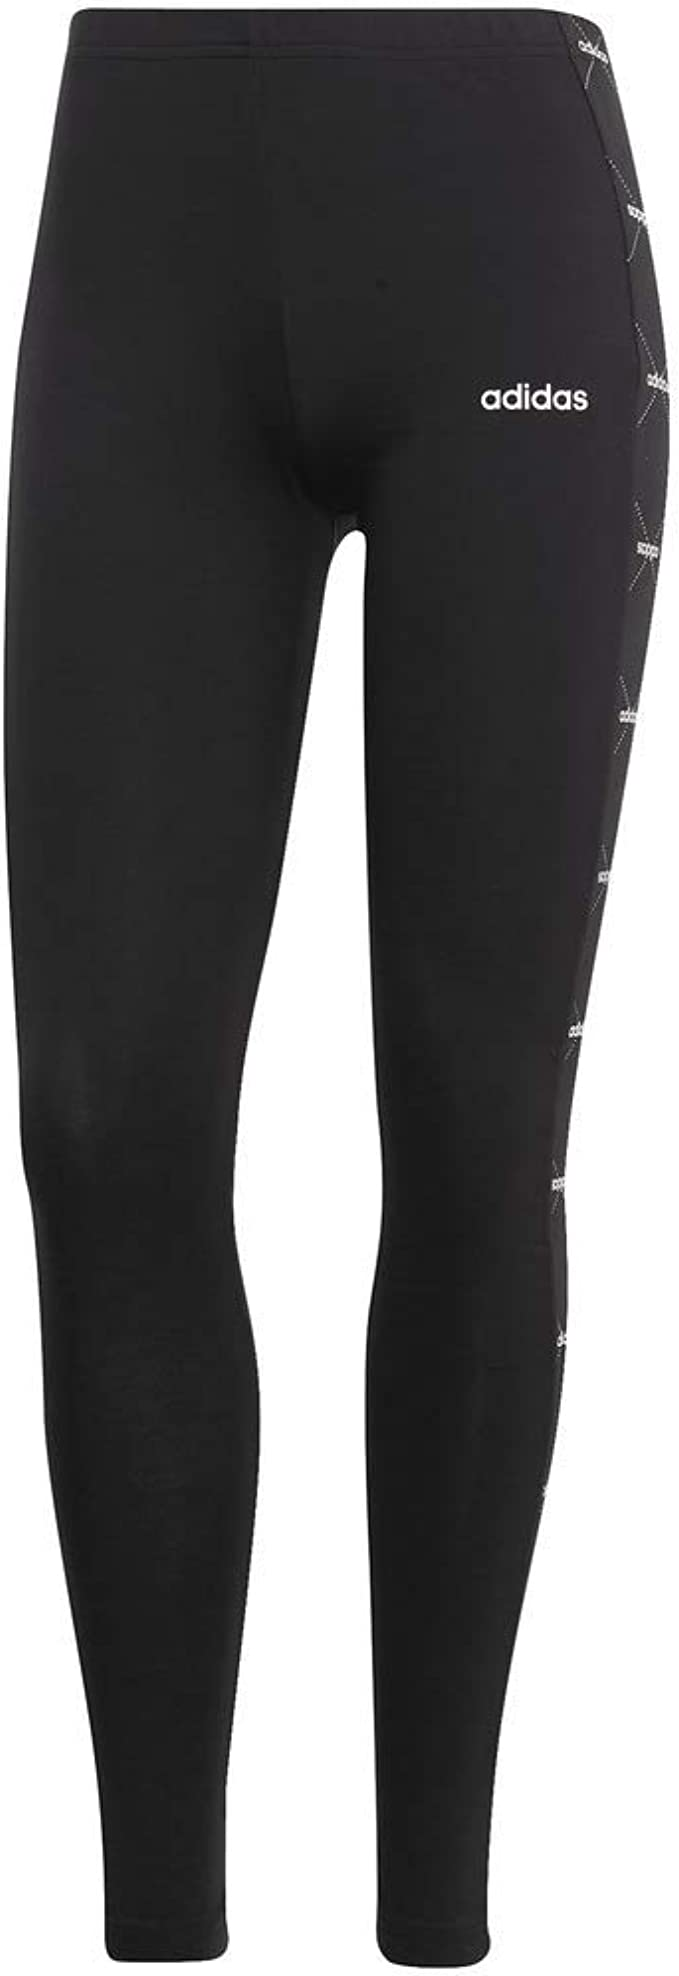 adidas Core Favorite Legging pour Femme: